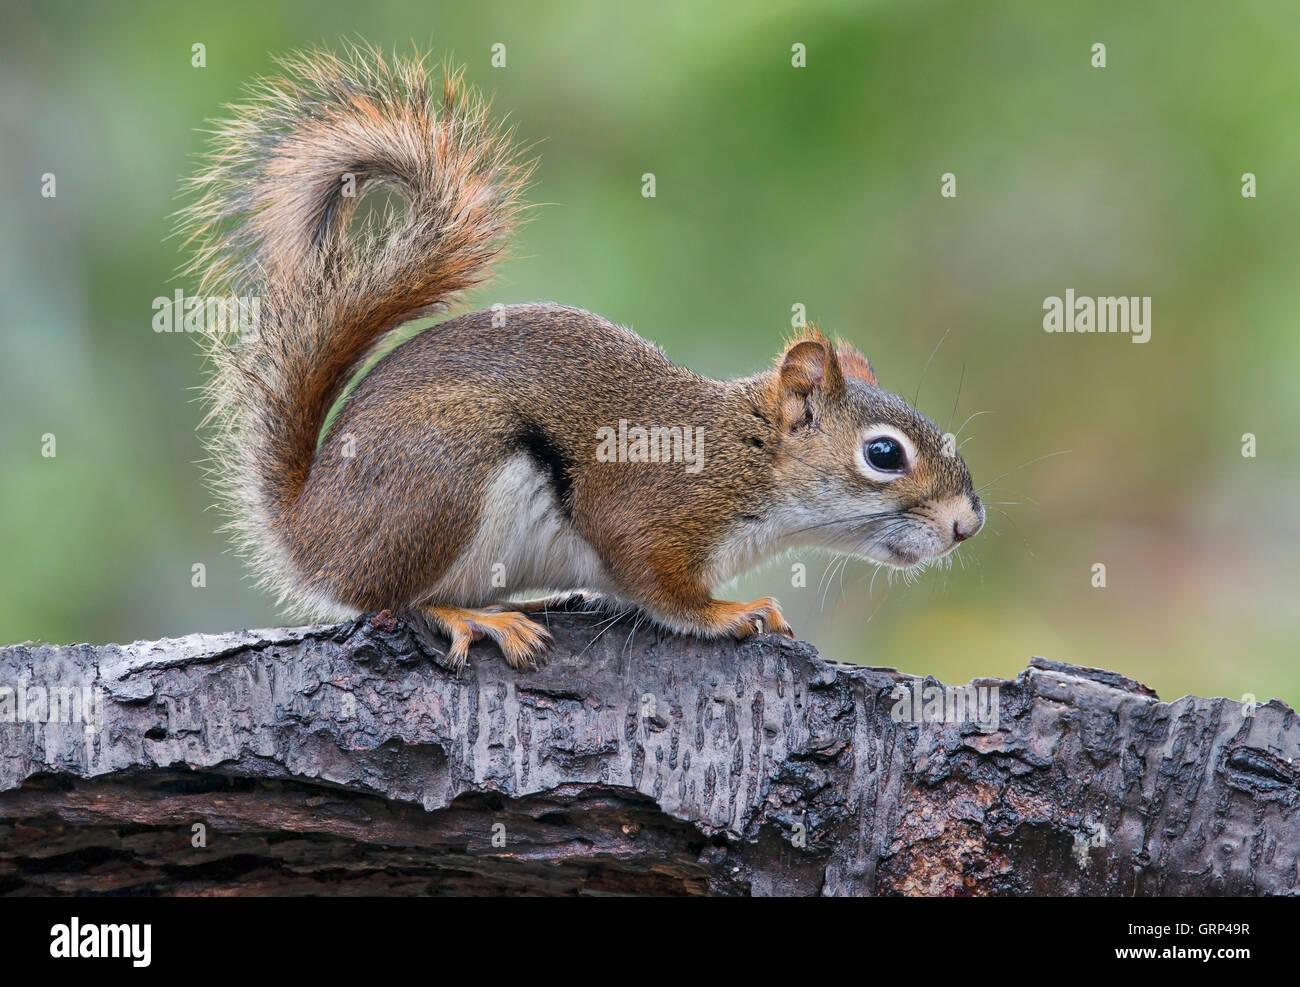 Eastern Red Squirrel making sounds, chatting (Tamiasciurus or Sciurus hudsonicus) E North America Stock Photo